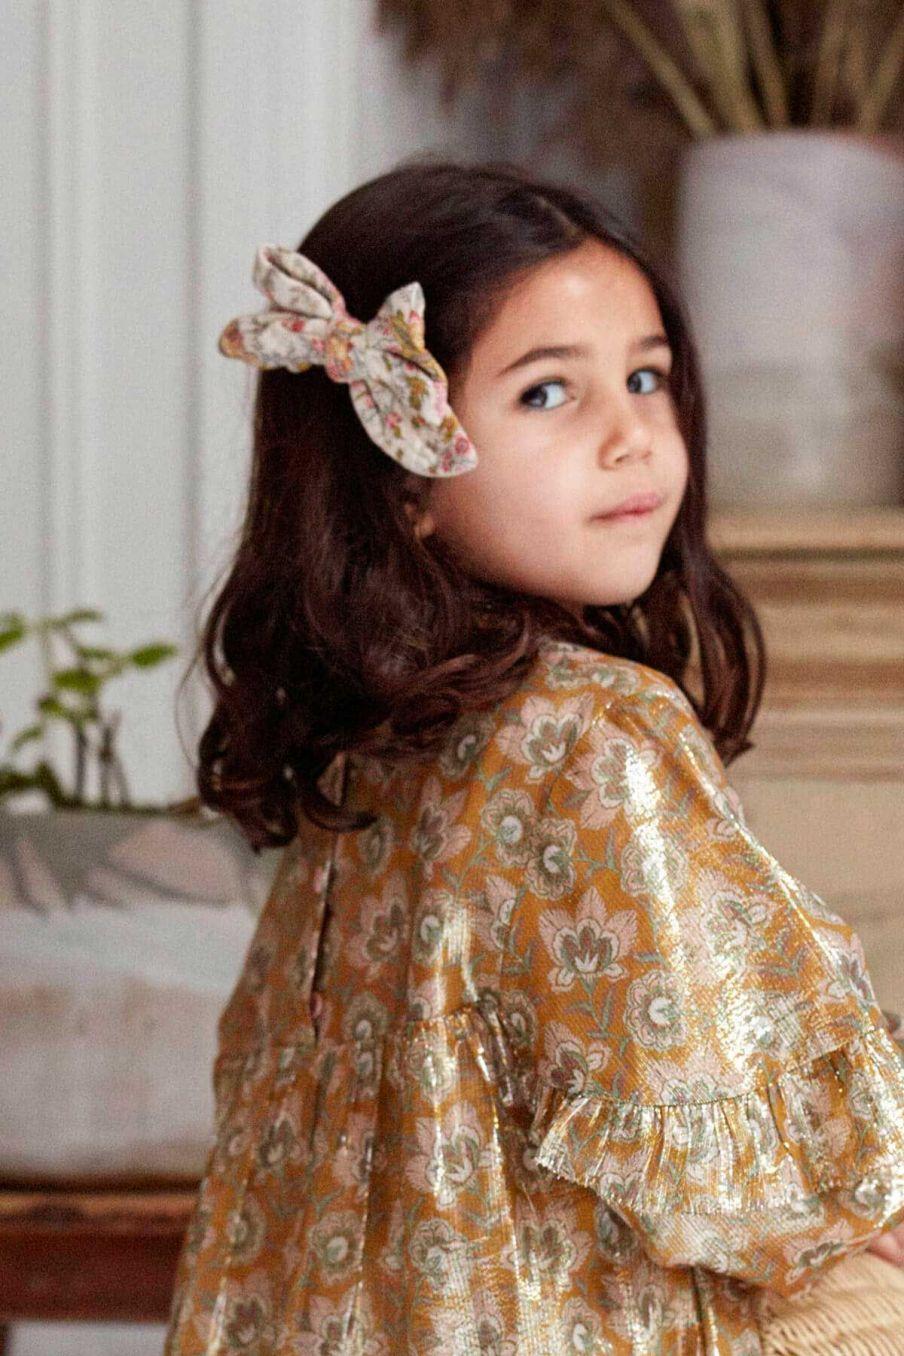 barrette fille lisa cream french flowers - louise misha